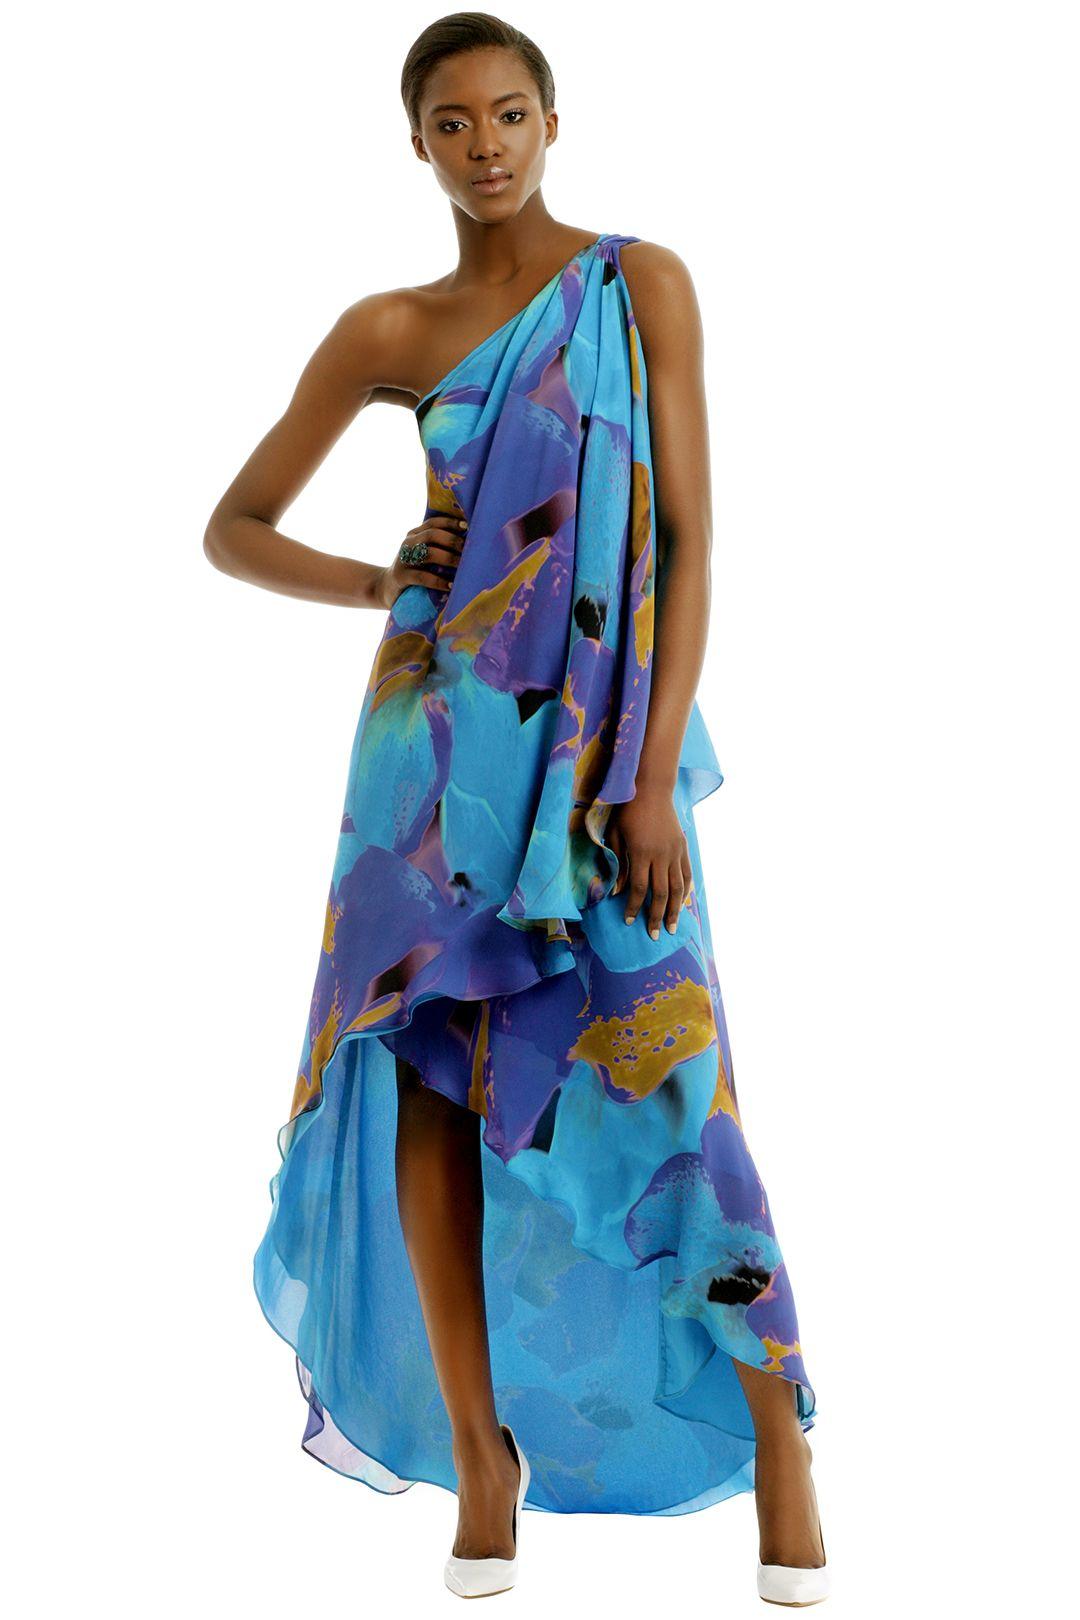 Halston Orissa Lagoon Maxi Beach Formal Attire Summer Wedding Attire Destination Dress [ 1620 x 1080 Pixel ]